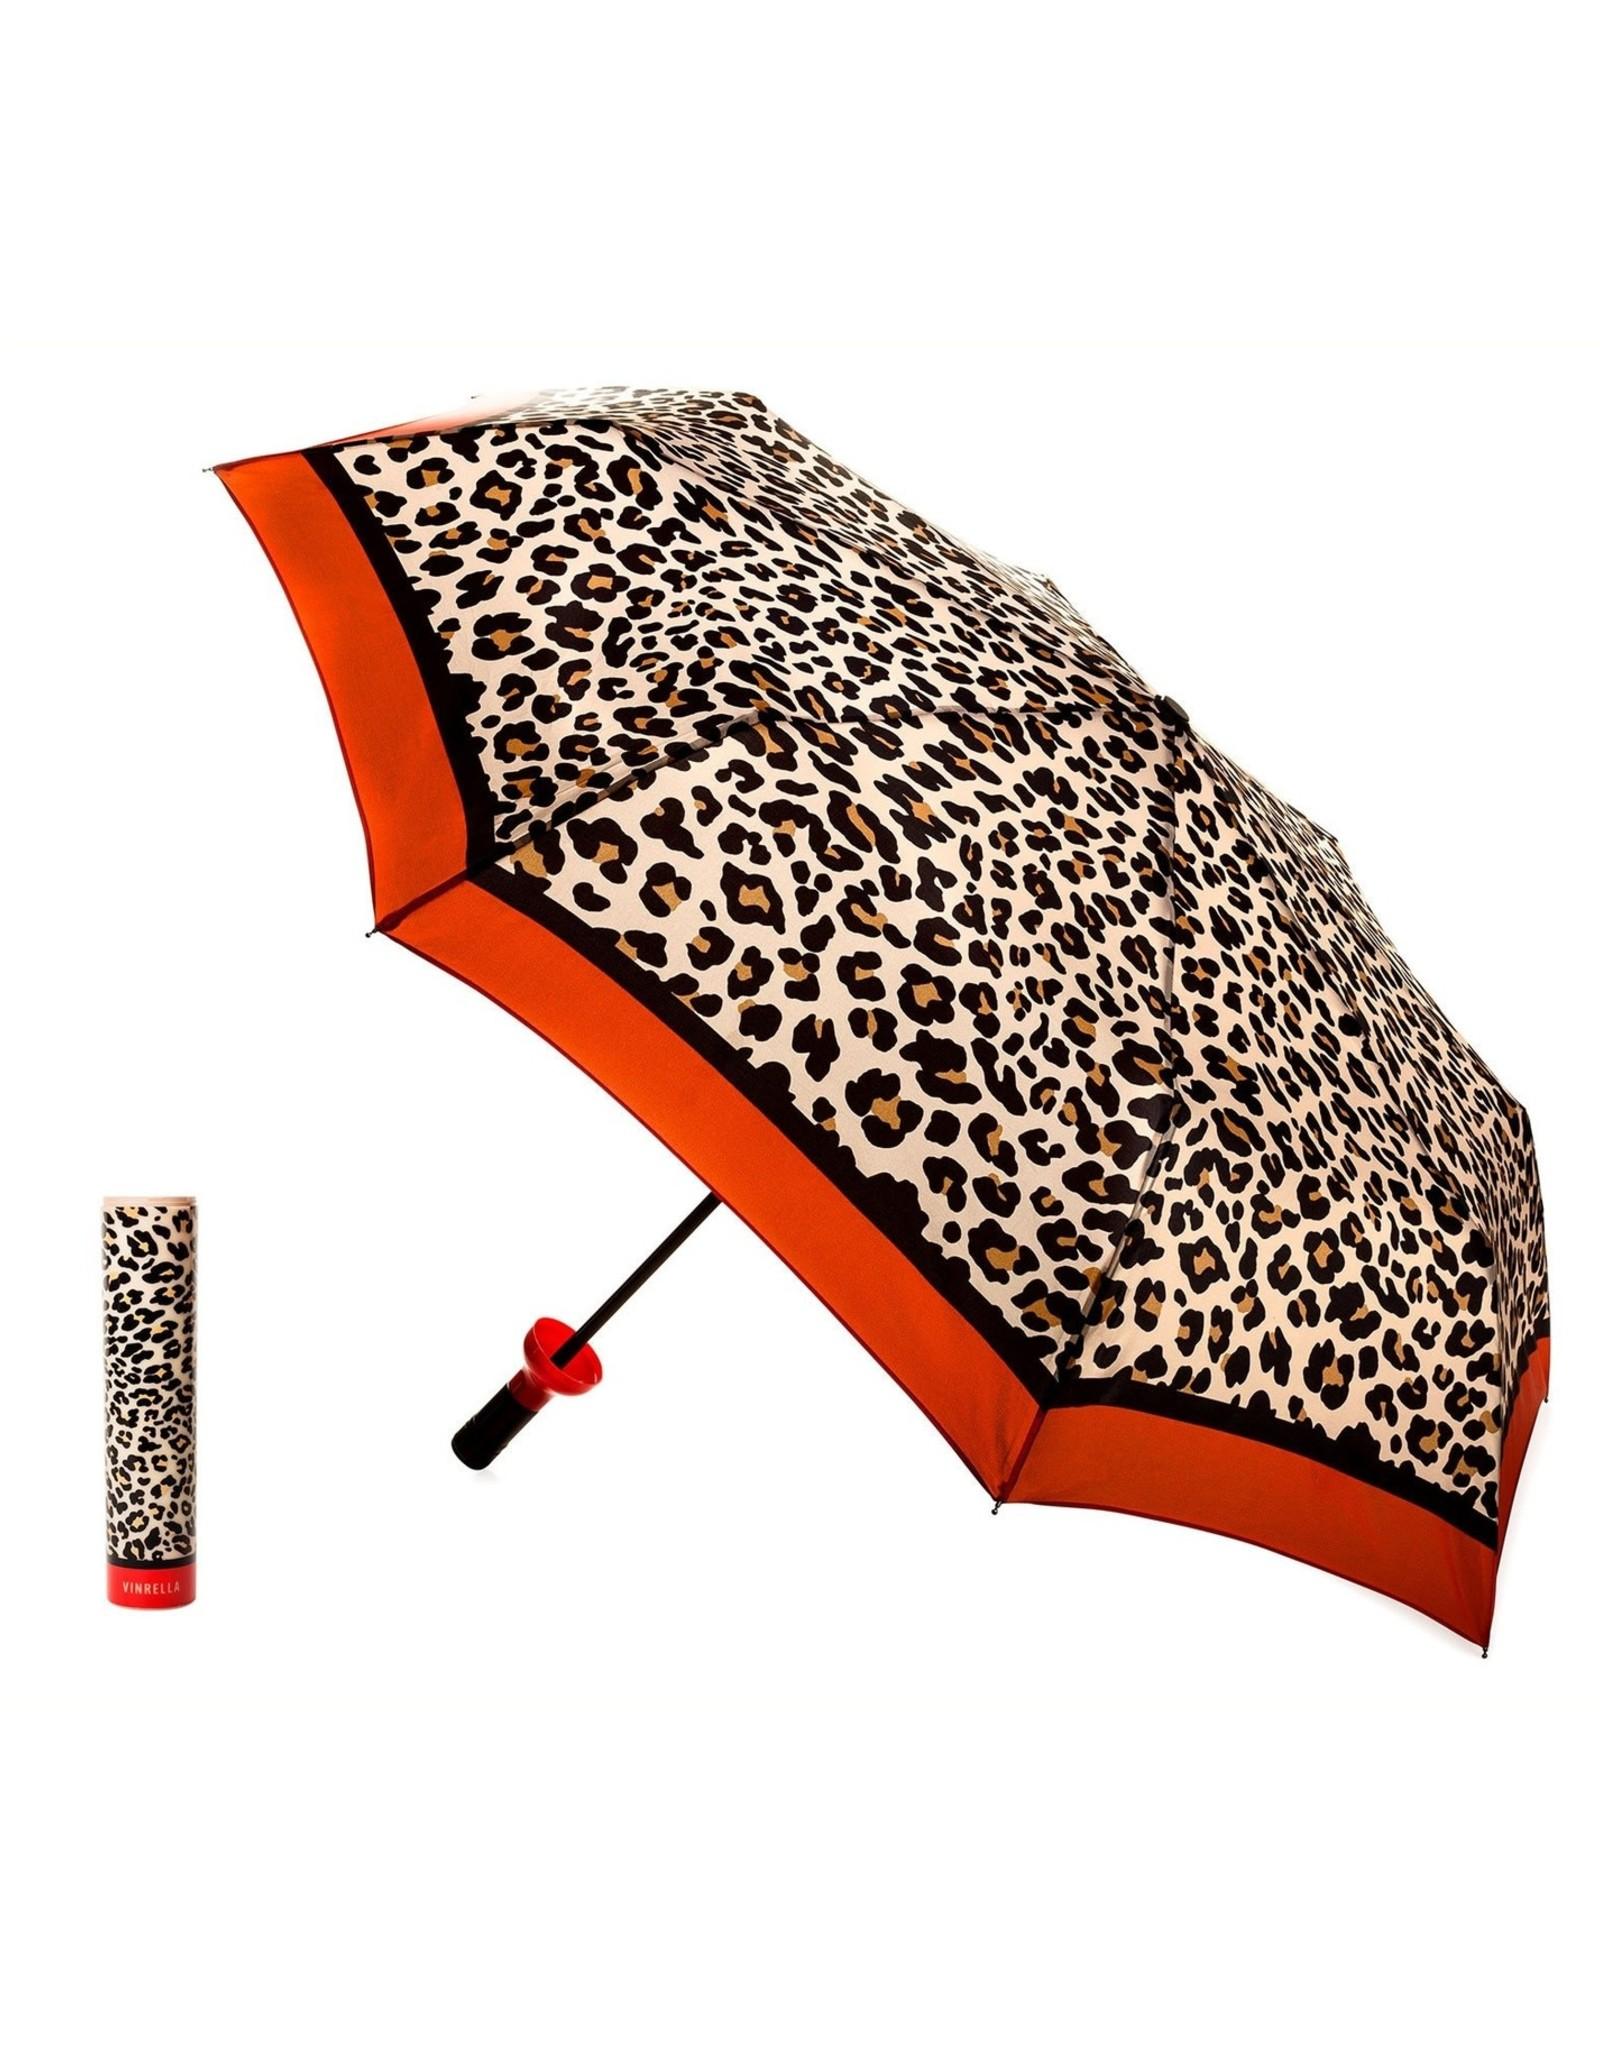 Wine Bottle Umbrella - Leopard Print